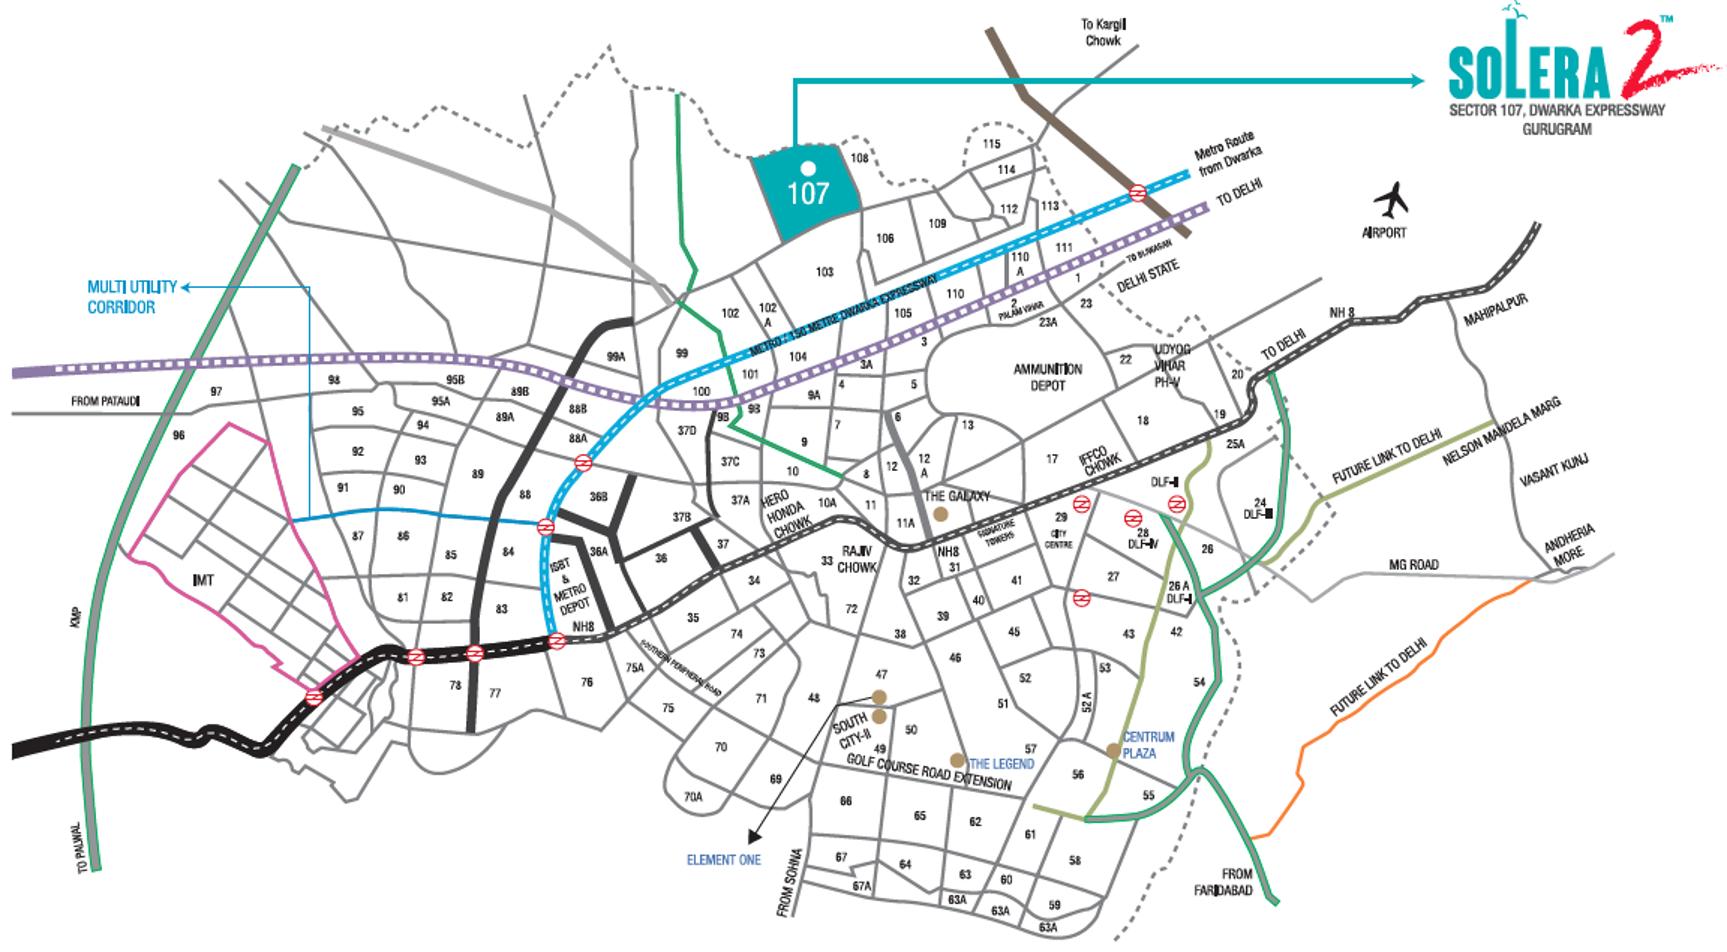 solera-2-location-plan-13519514